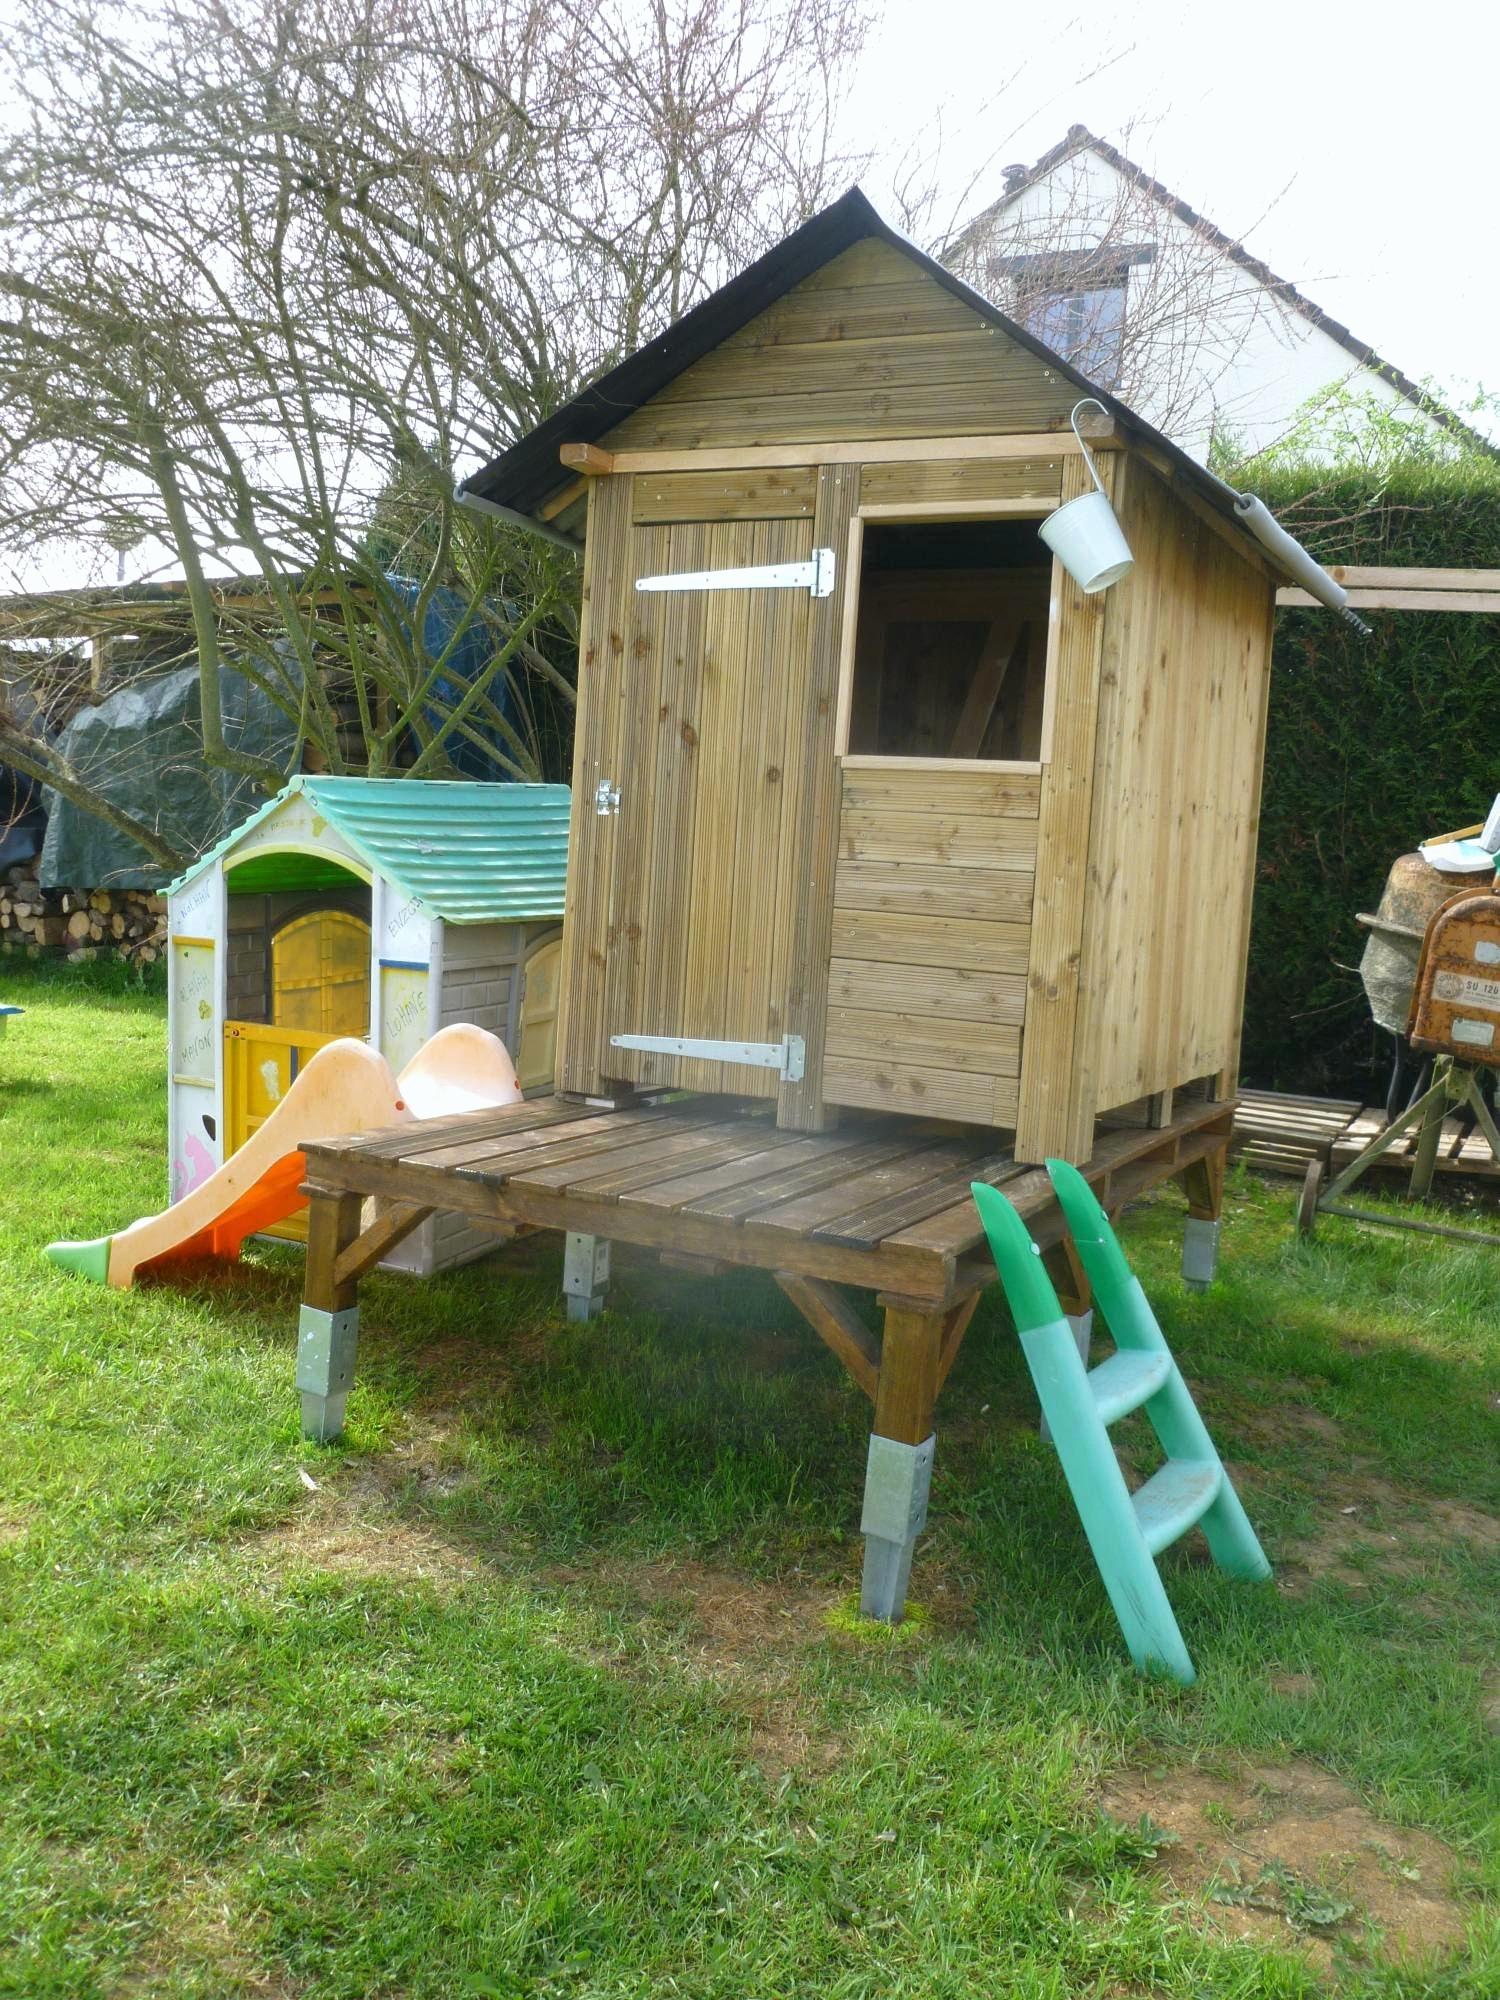 Cabane De Jardin Brico Depot Beau Photographie Abrit De Jardin Luxe Un Abri De Jardin Awesome Garage Kits Garage